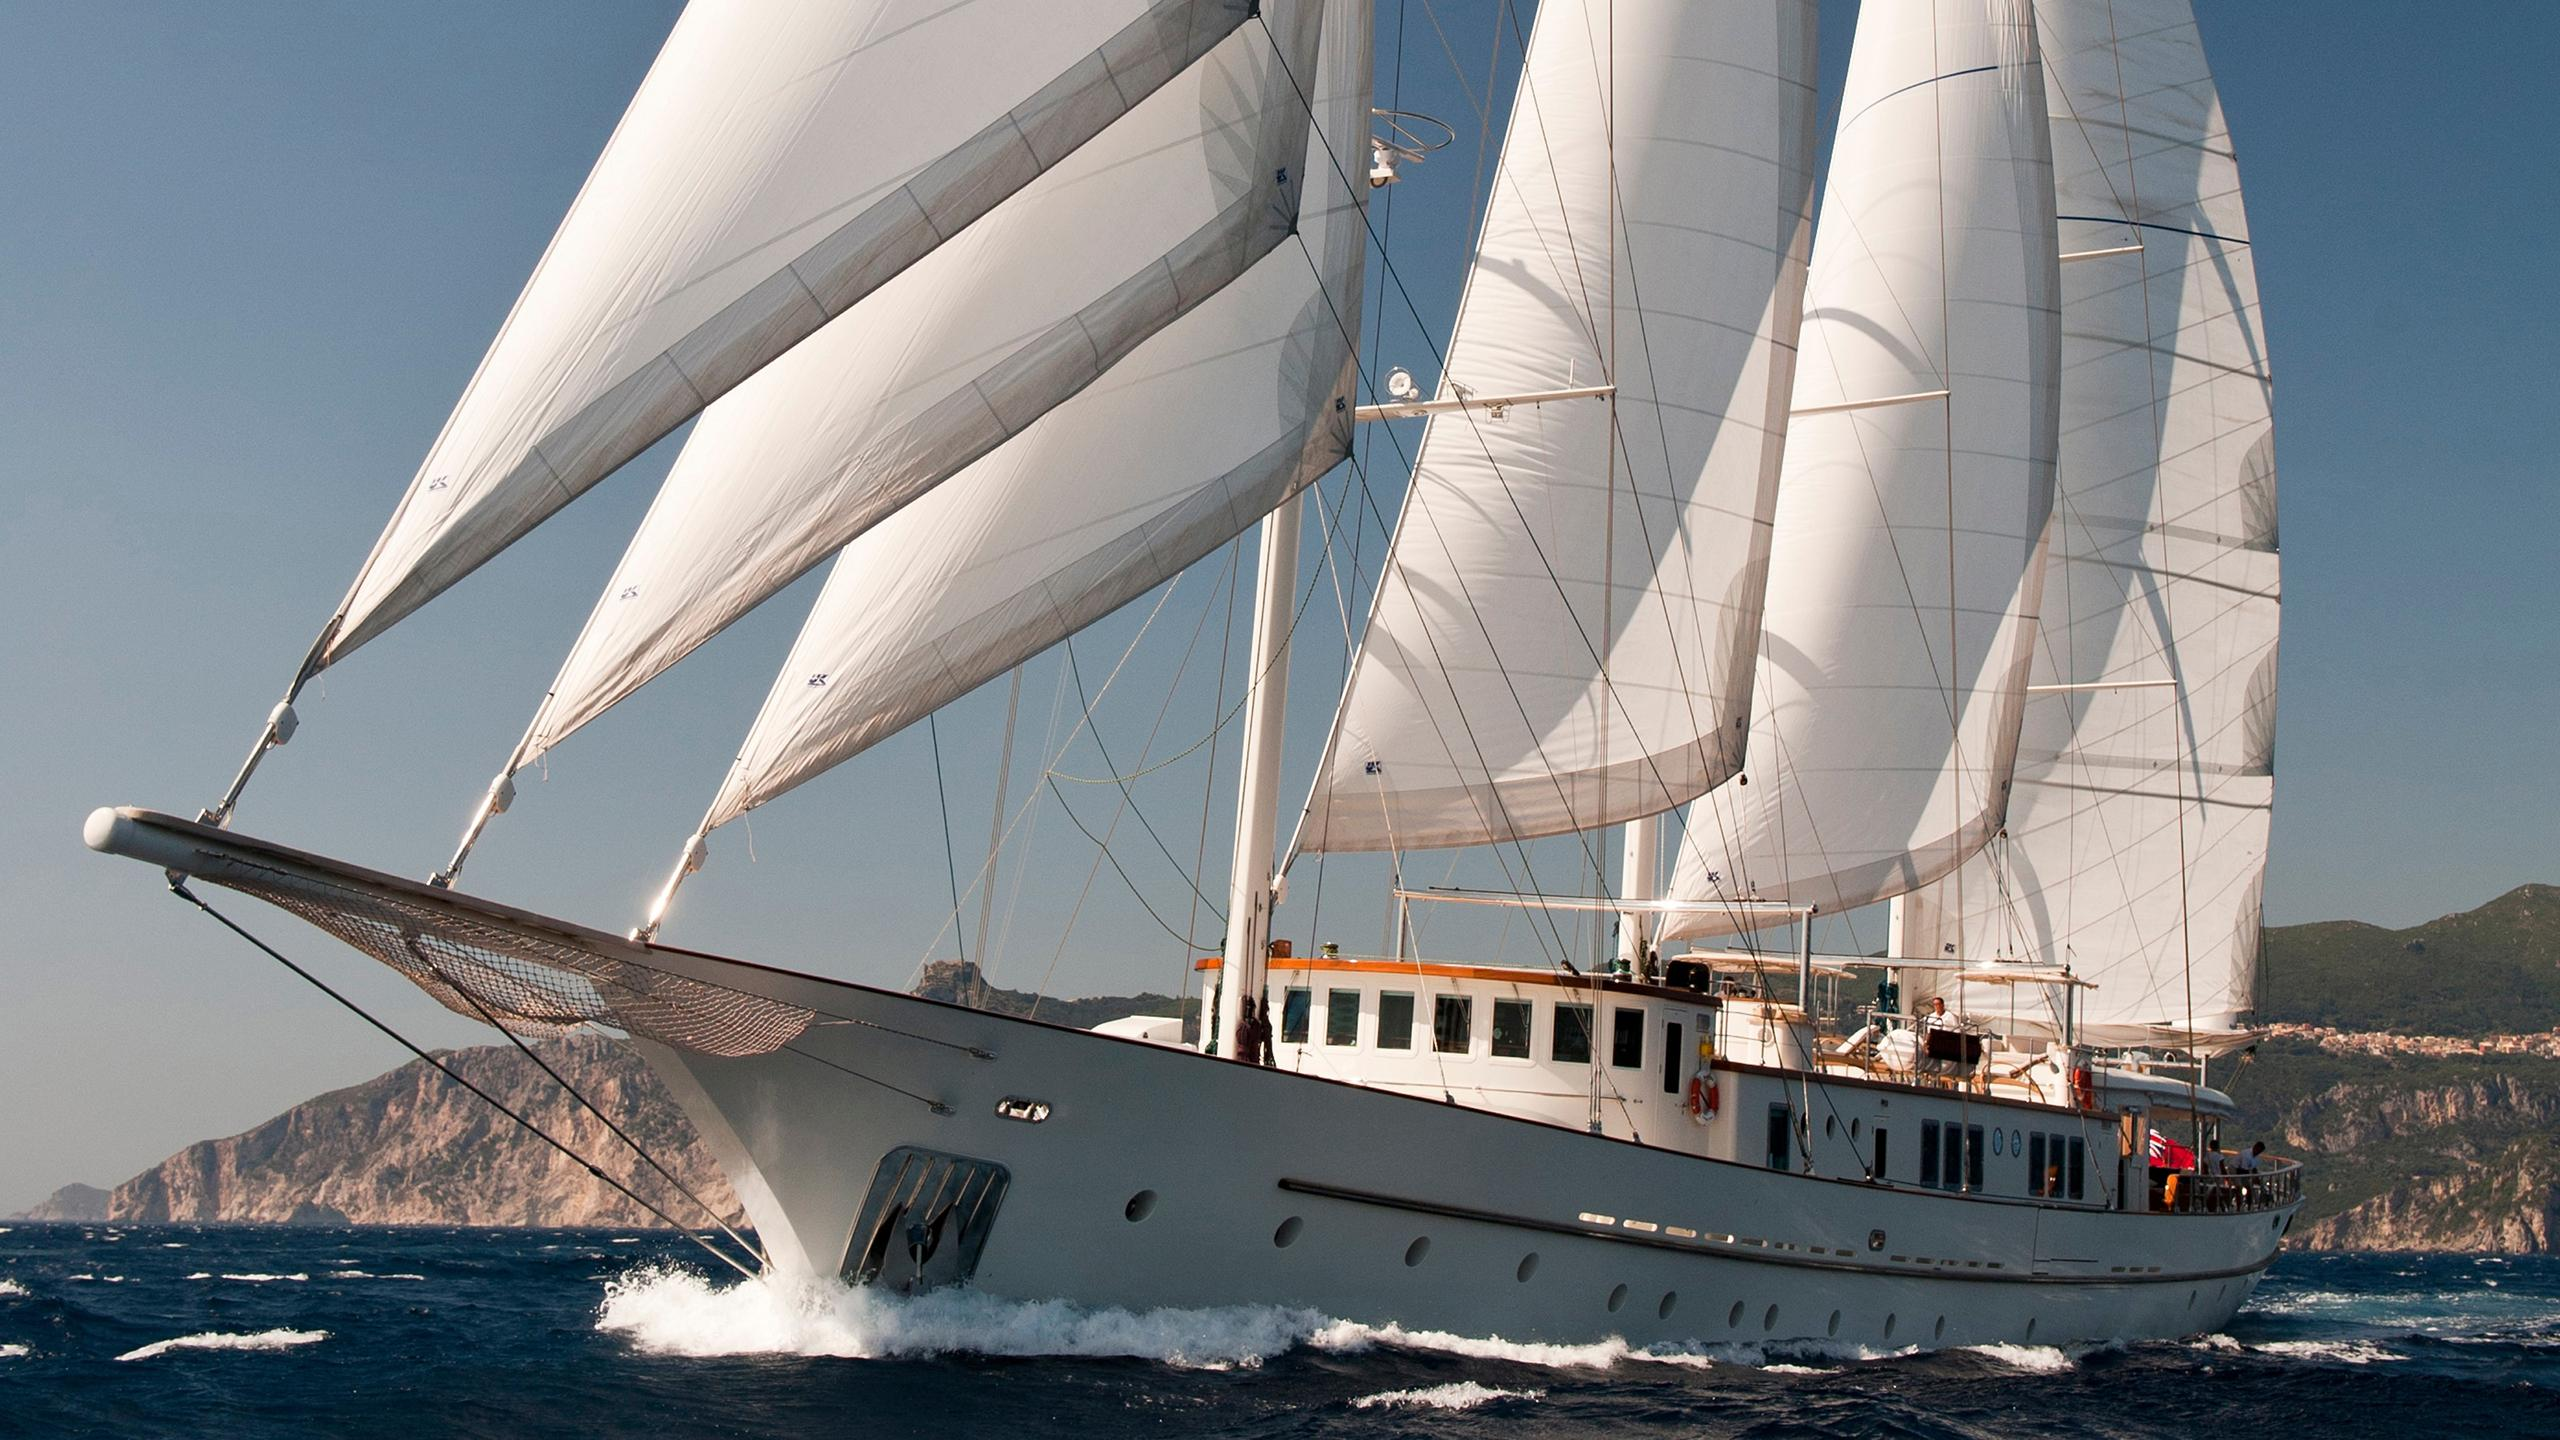 loretta montigne sailing yacht aegean yacht 57m 2009 half profile